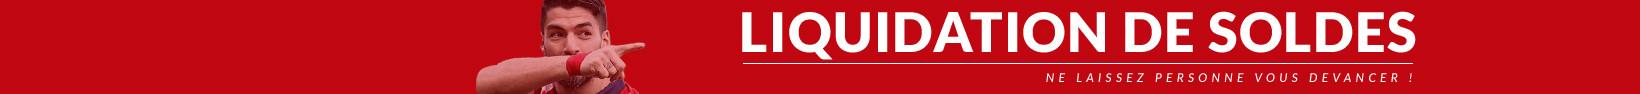 liquidacion_rebajas_barrita_FR.jpg